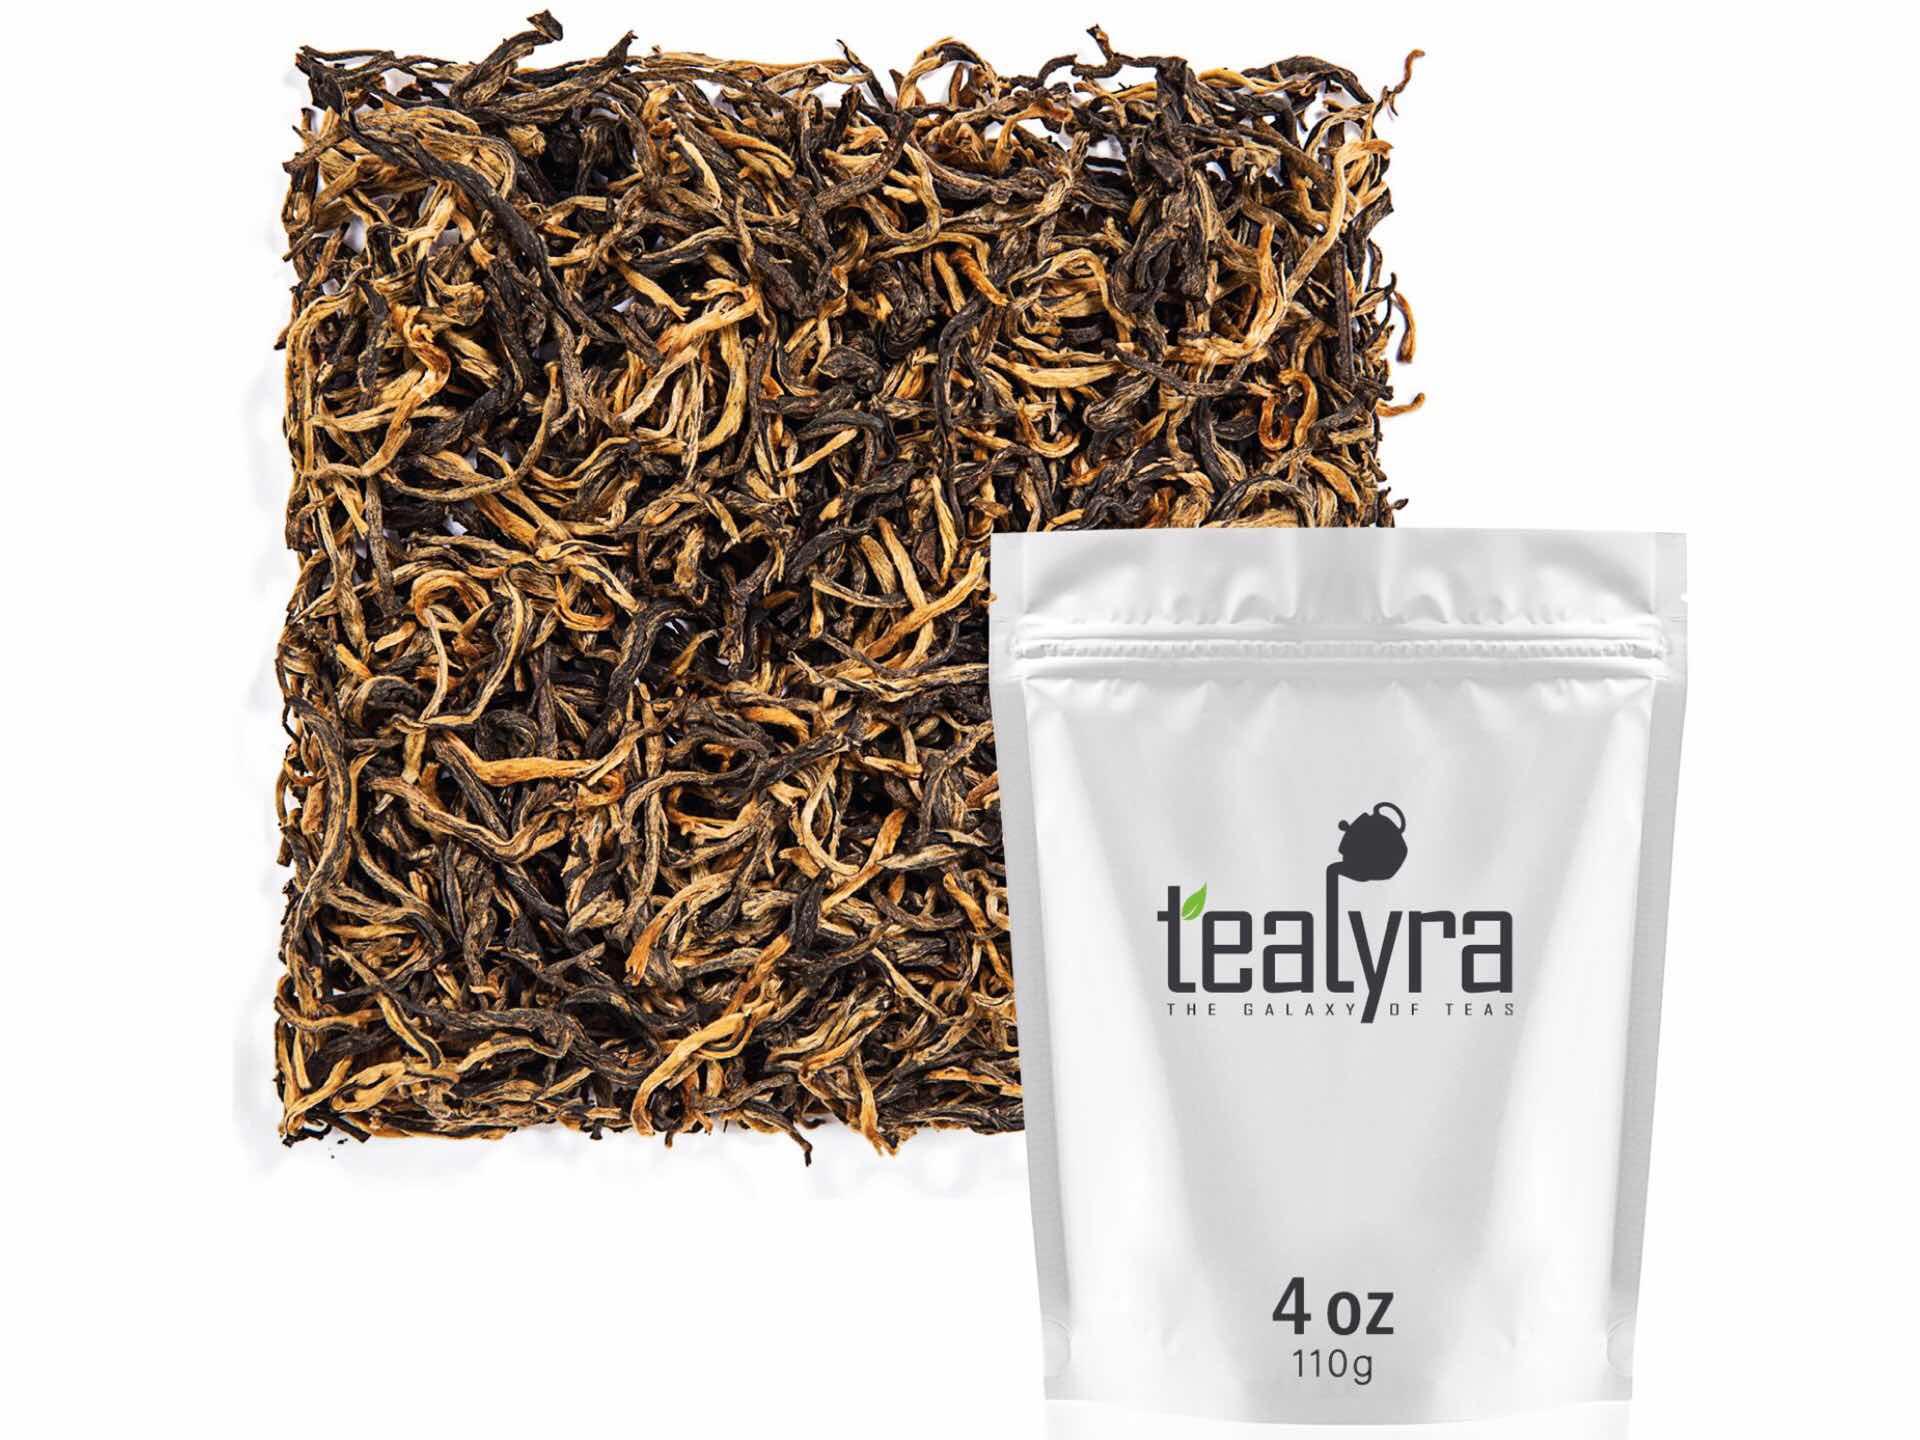 tealyra-yunnan-golden-special-loose-leaf-black-tea